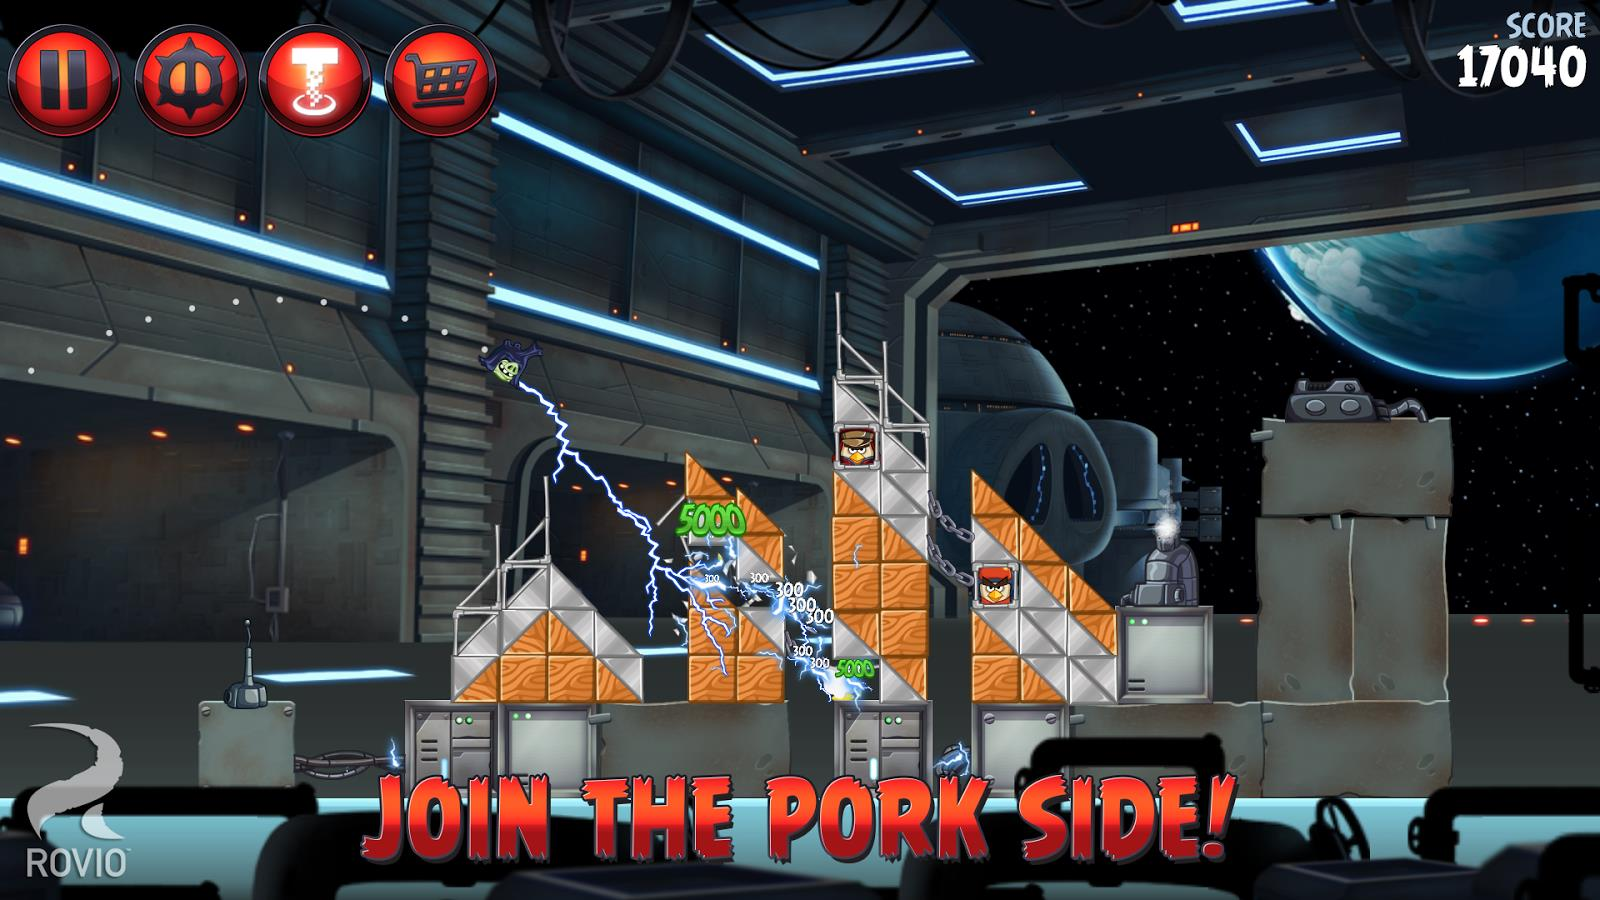 Angry Birds Star Wars II - Imagem 1 do software